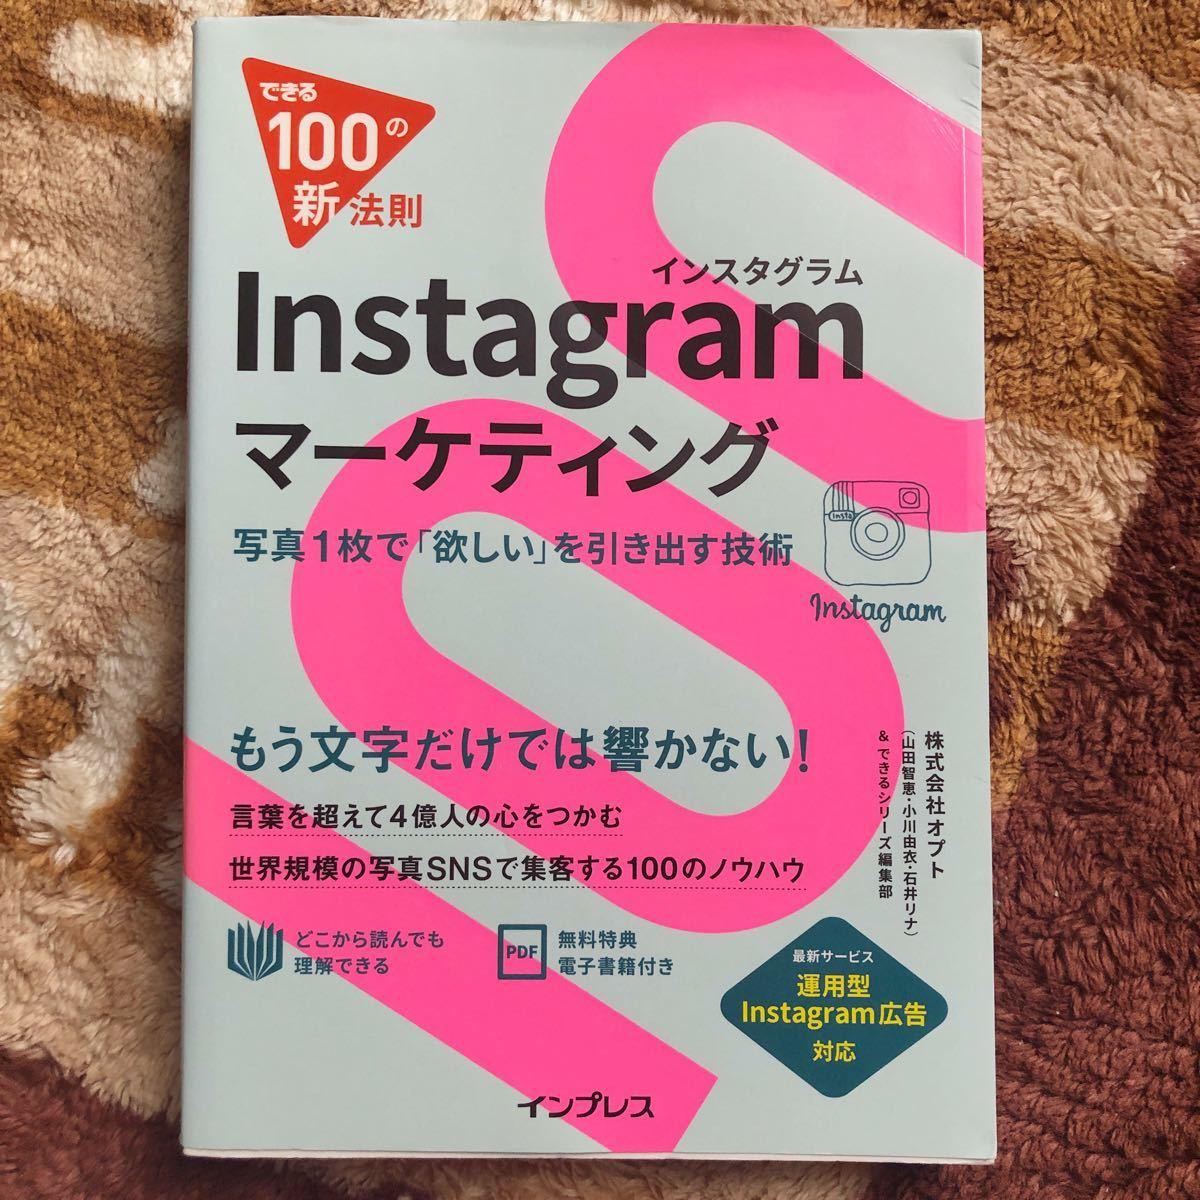 「Instagramマーケティング 写真1枚で「欲しい」を引き出す技術」オプト / できるシリーズ編集部